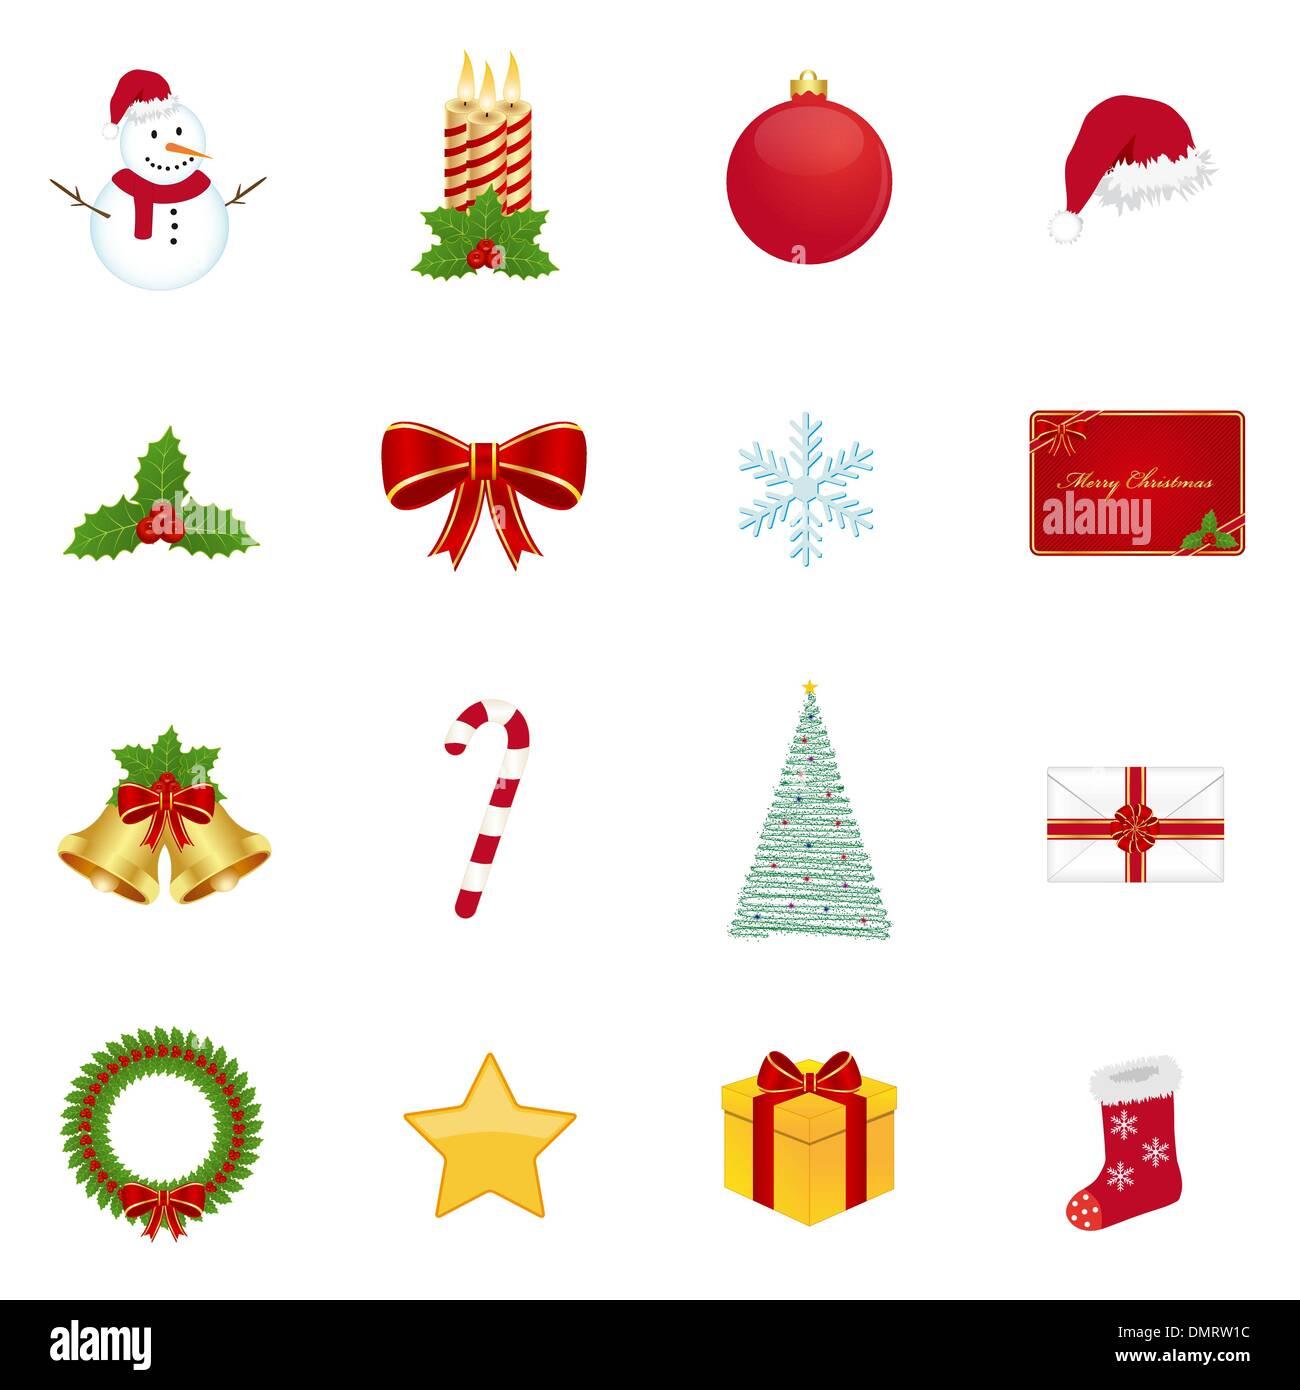 Christmas Icons Imágenes De Stock & Christmas Icons Fotos De Stock ...